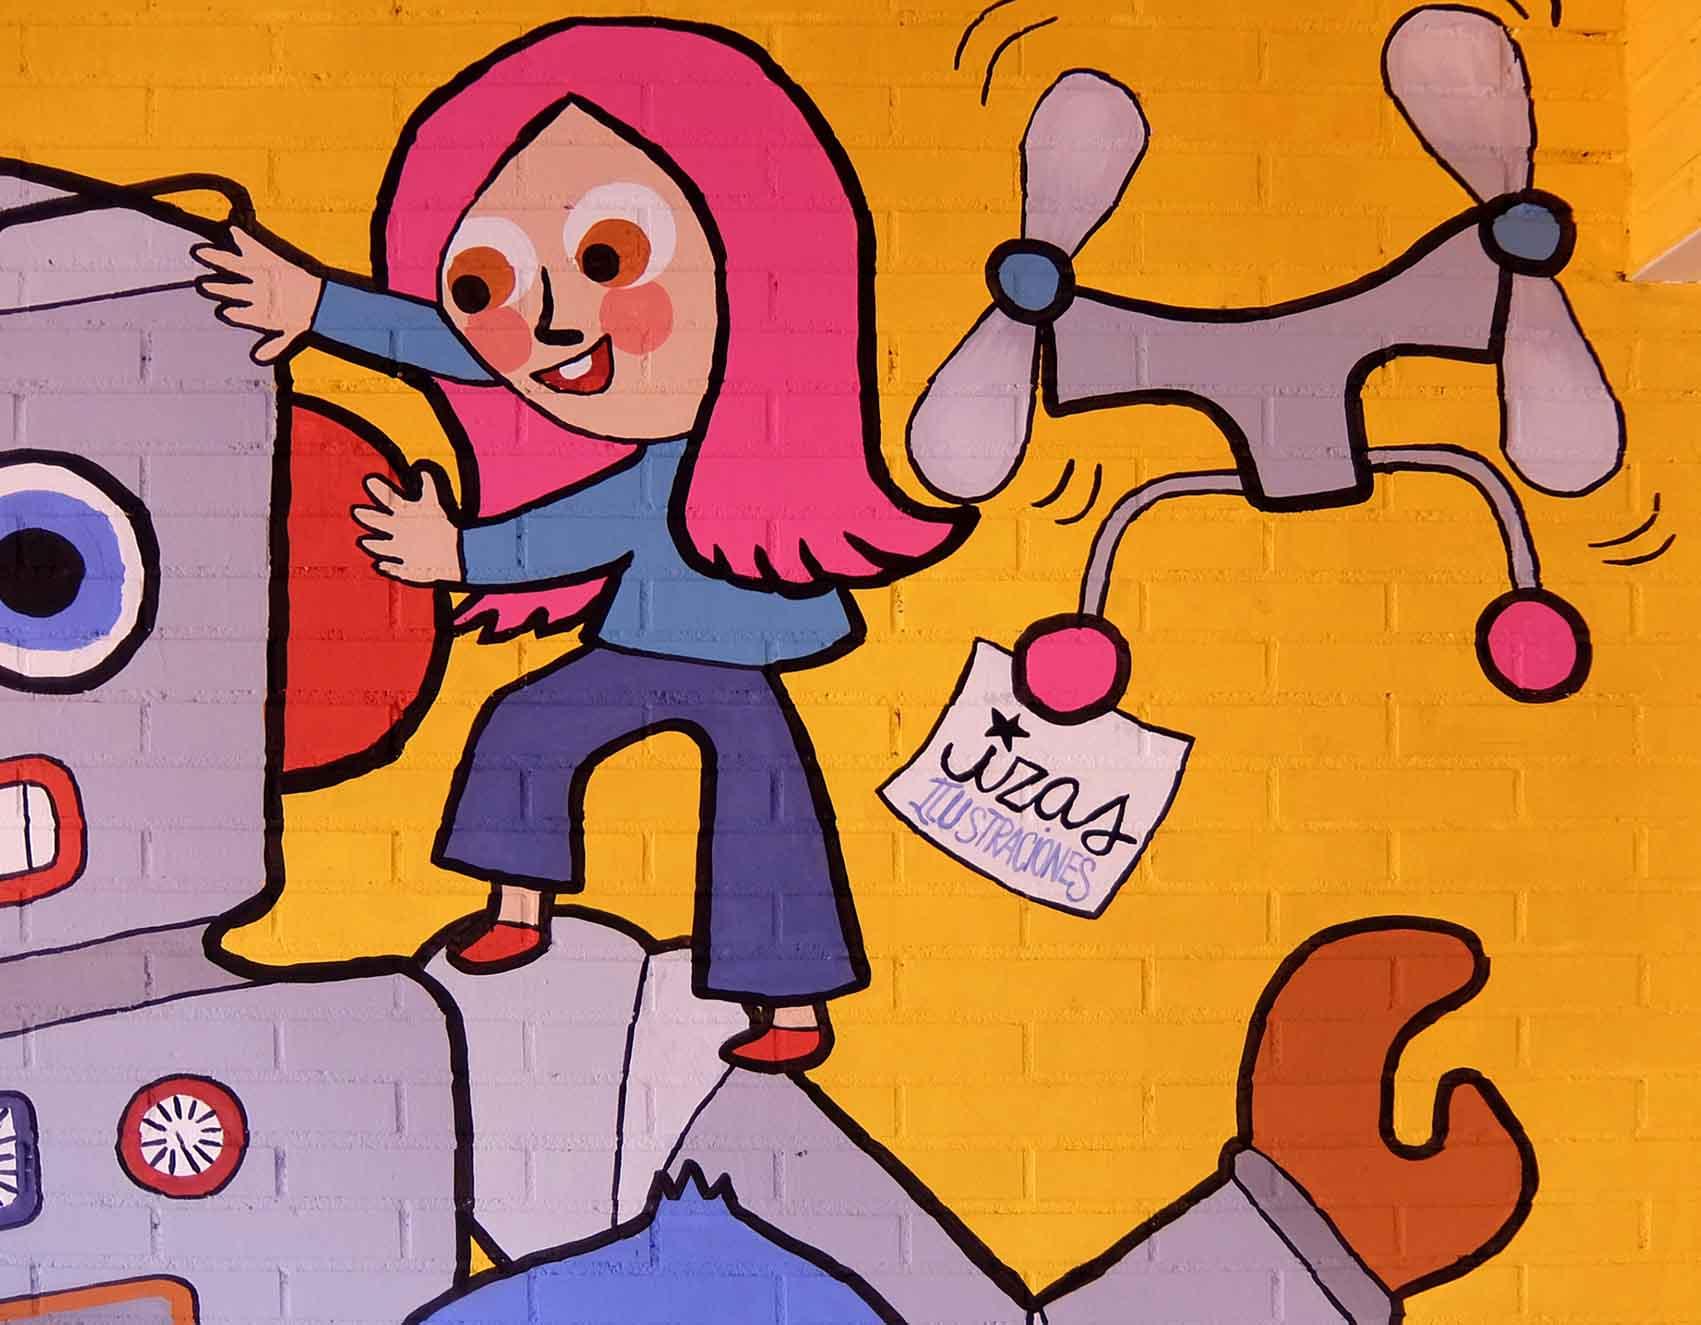 mural izas rosa luxemburgo robótica y biblioteca 11